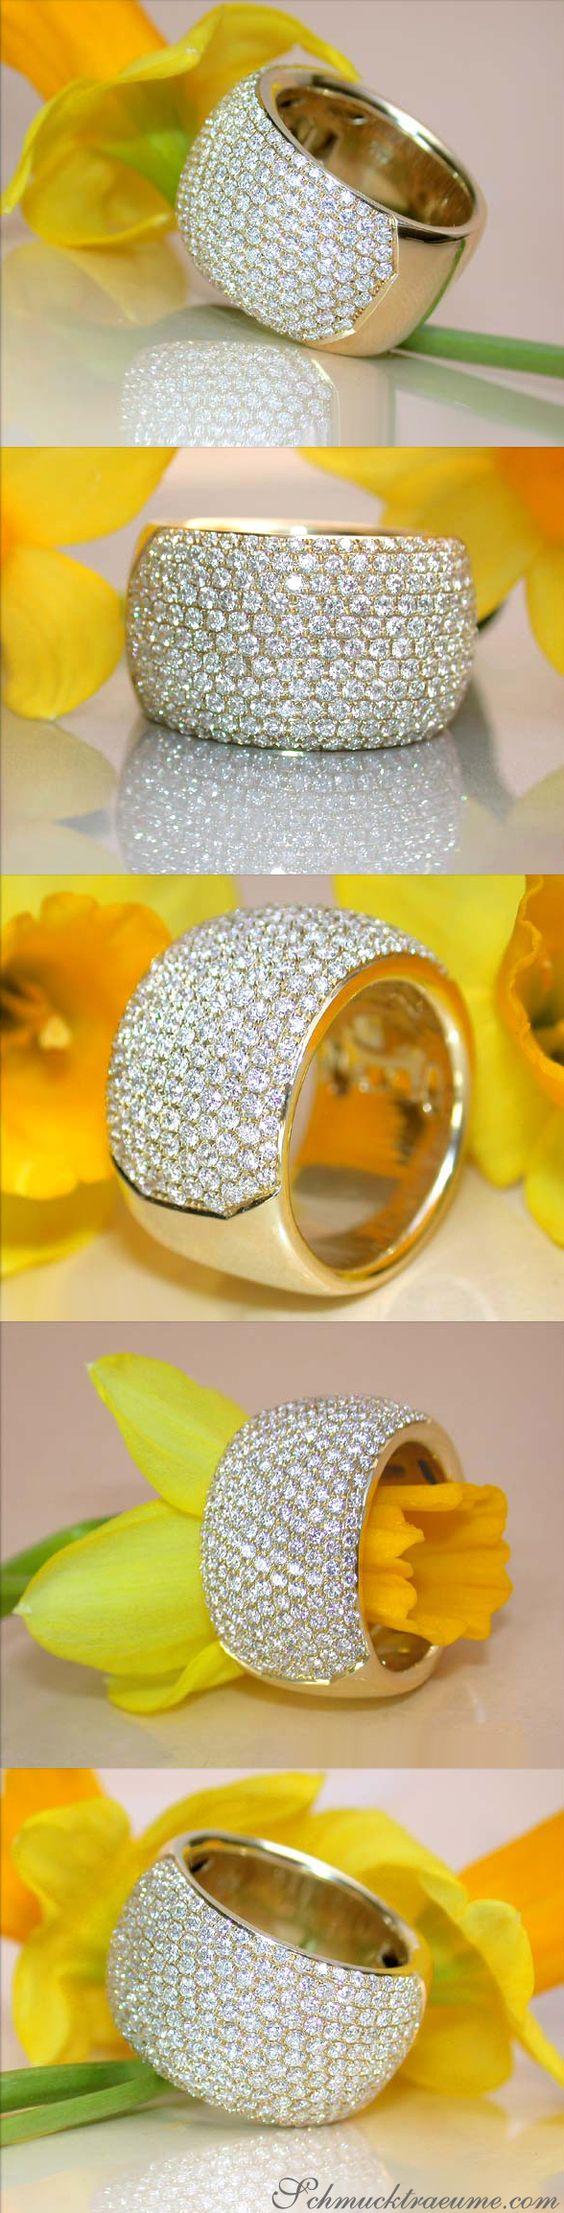 Impressive Micro Pave Diamond Band (2.17 ct. G VS) in Yellowgold 18k - schmucktraeume.com Like: https://www.facebook.com/Noble-Juwelen-150871984924926/